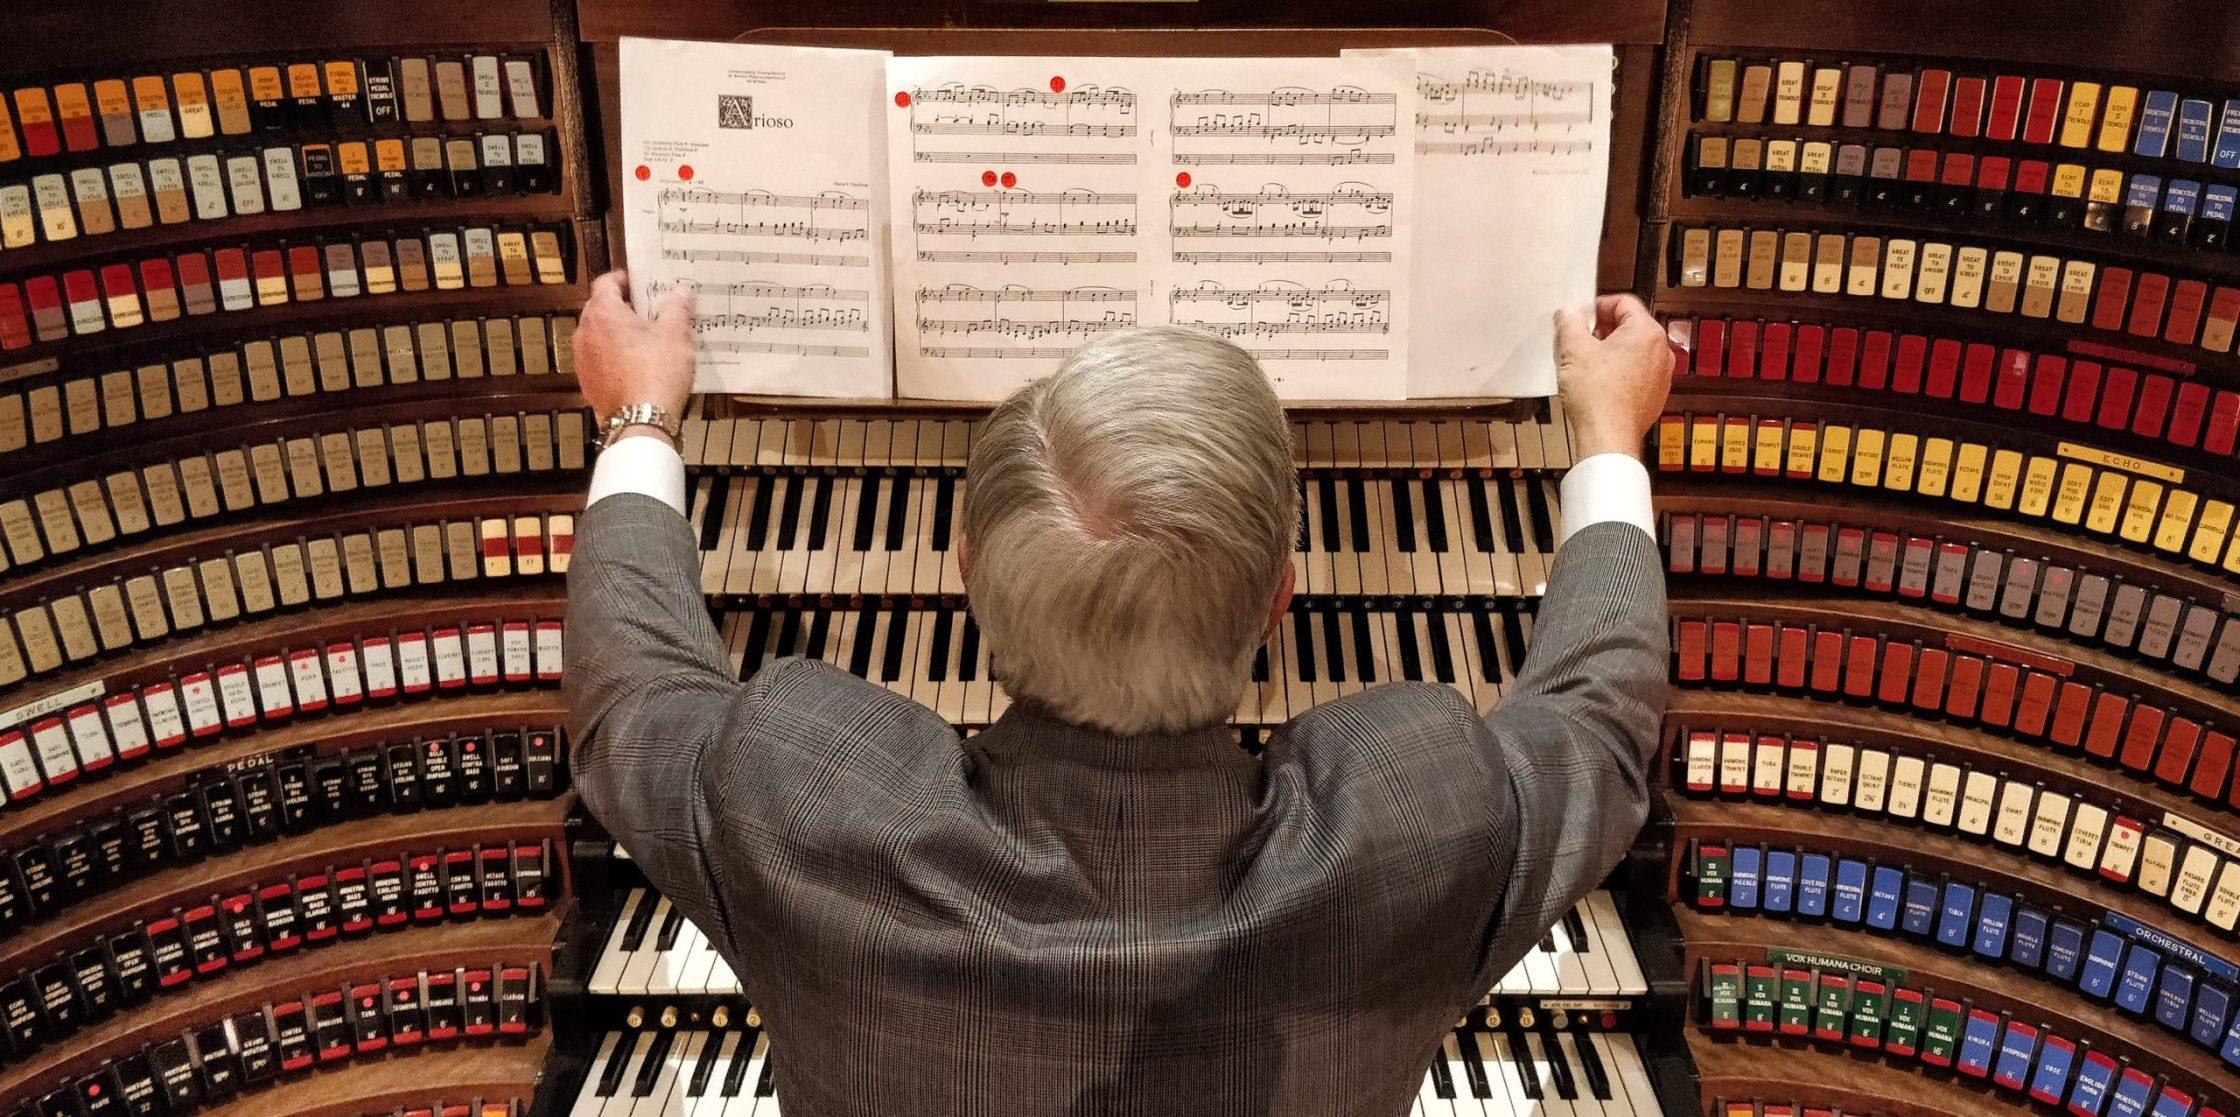 Piano & Keyboard